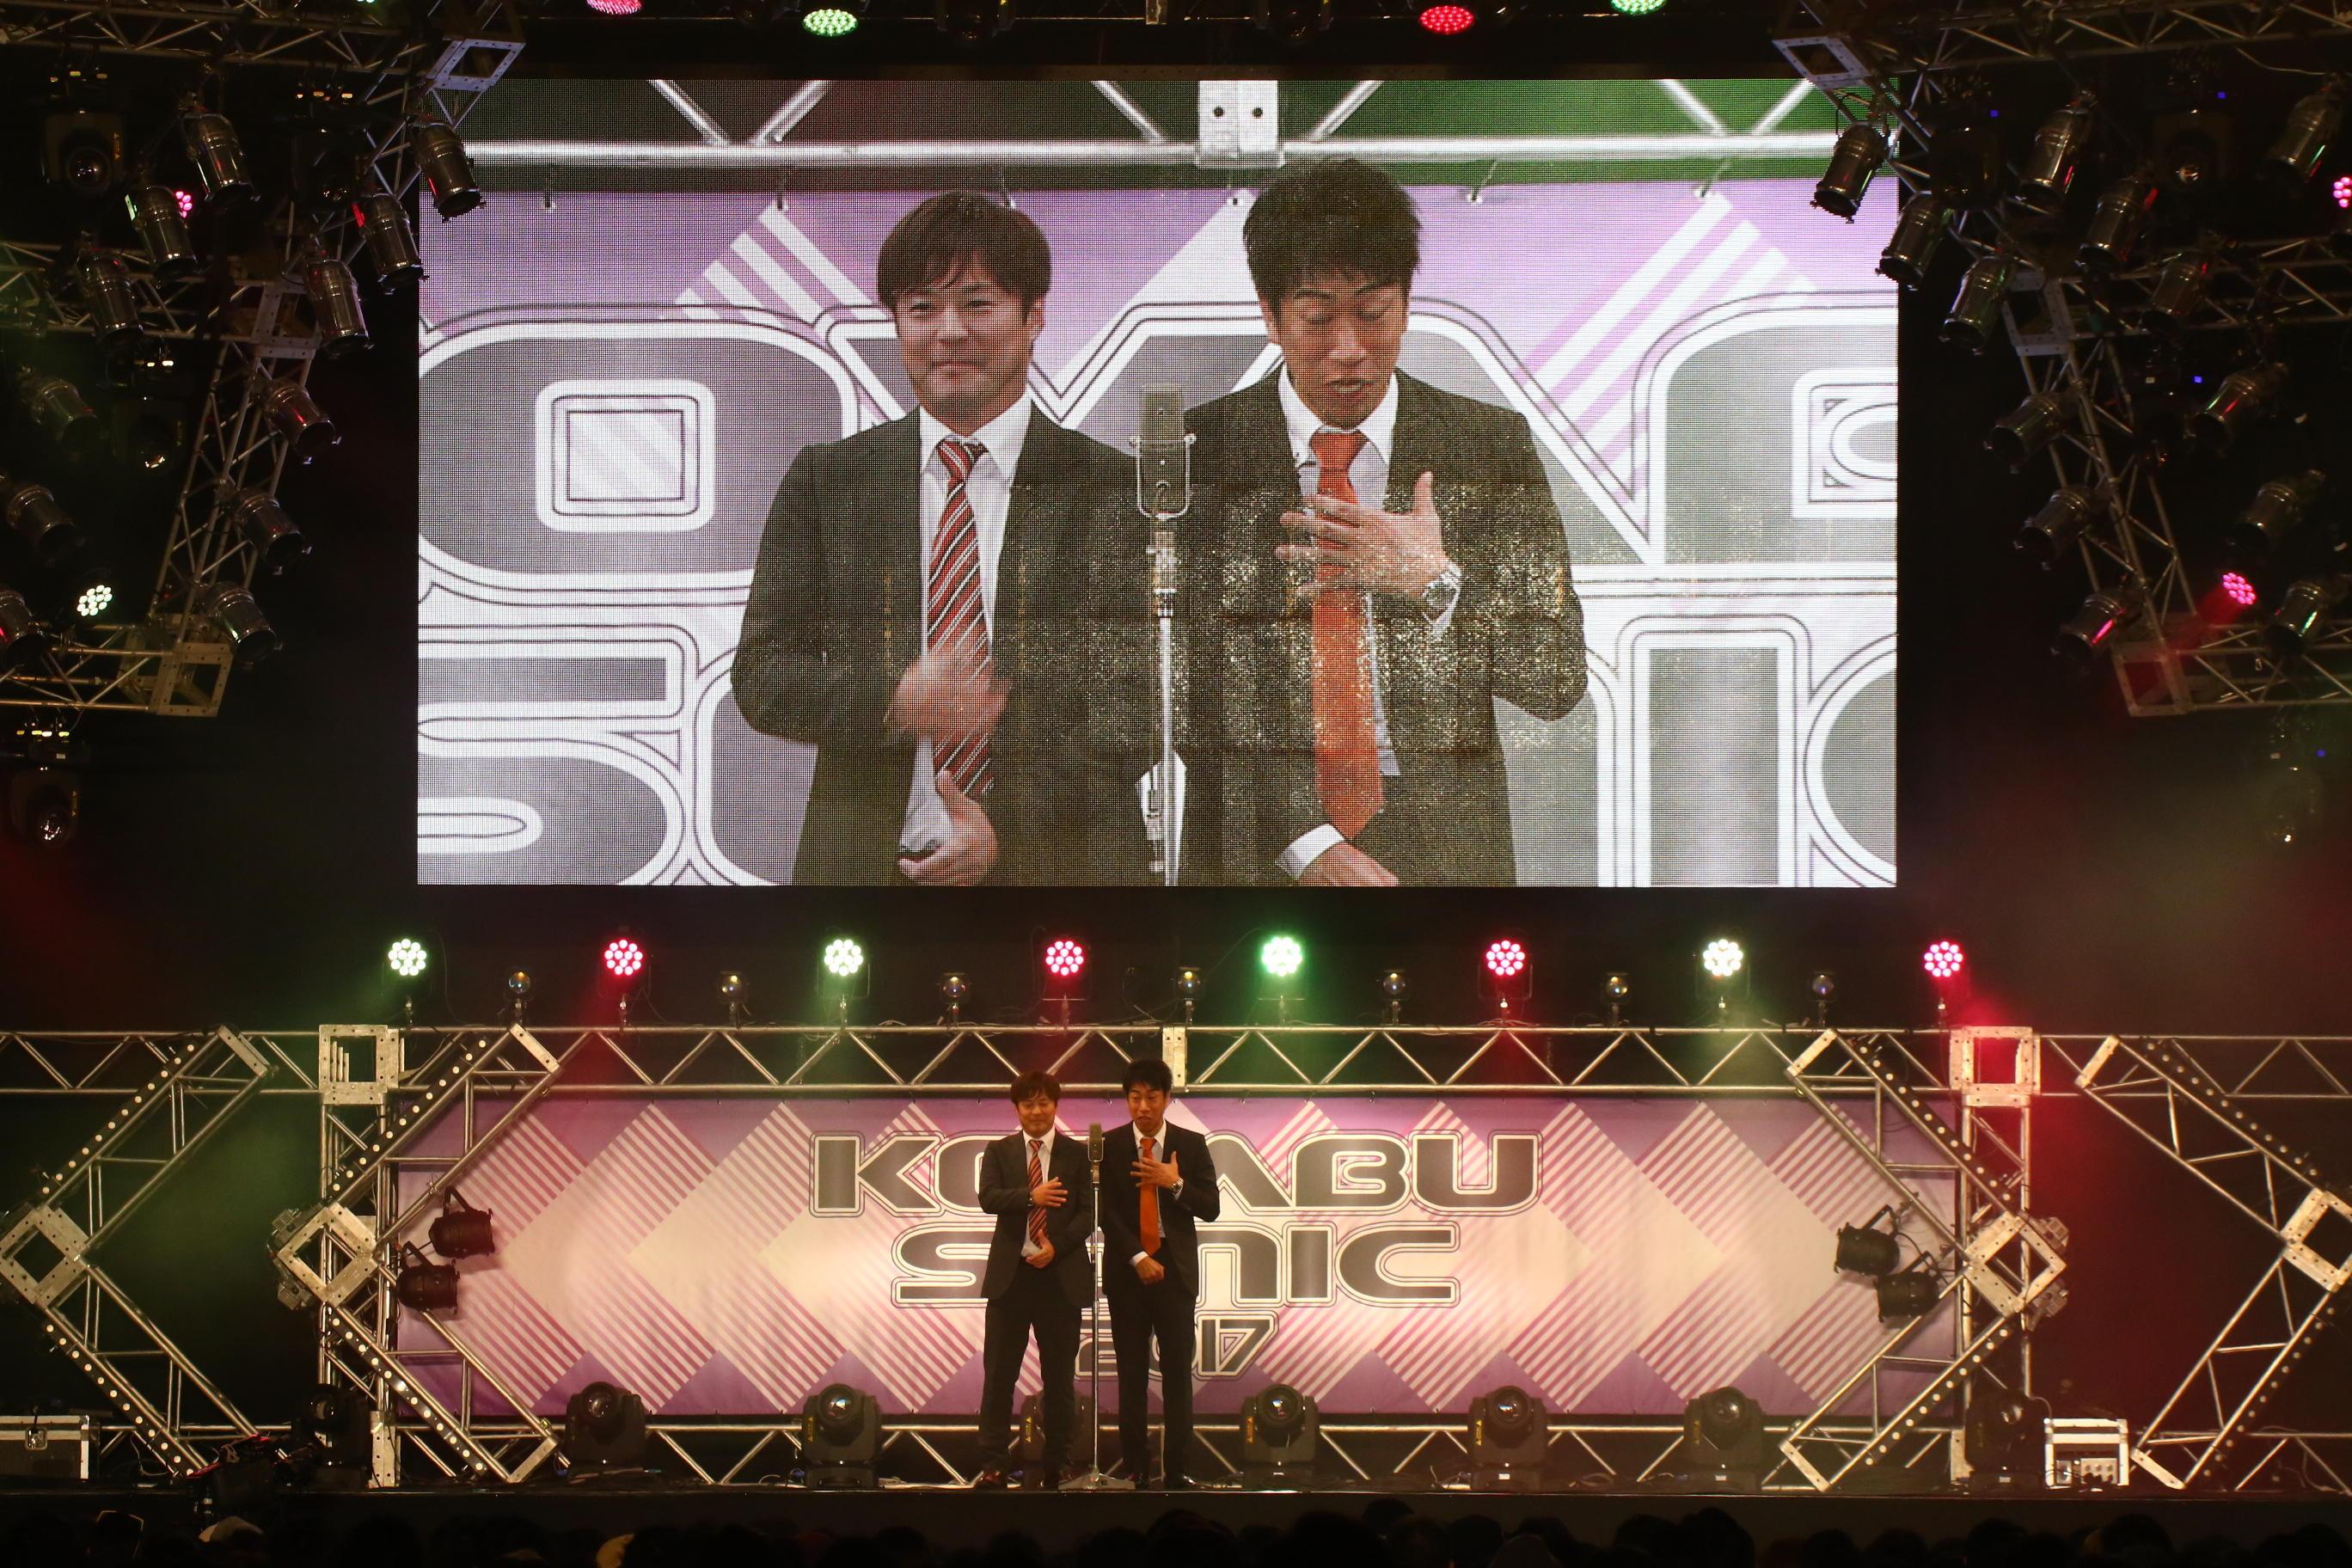 http://news.yoshimoto.co.jp/20171106133616-8d57accaf500ae6e7aef2e79f28a91ef6a6c7eeb.jpg